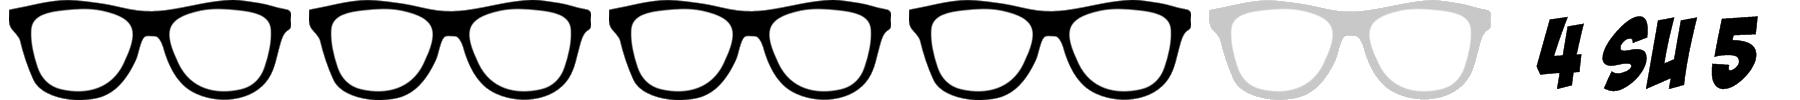 occhiali nerd 4 su 5